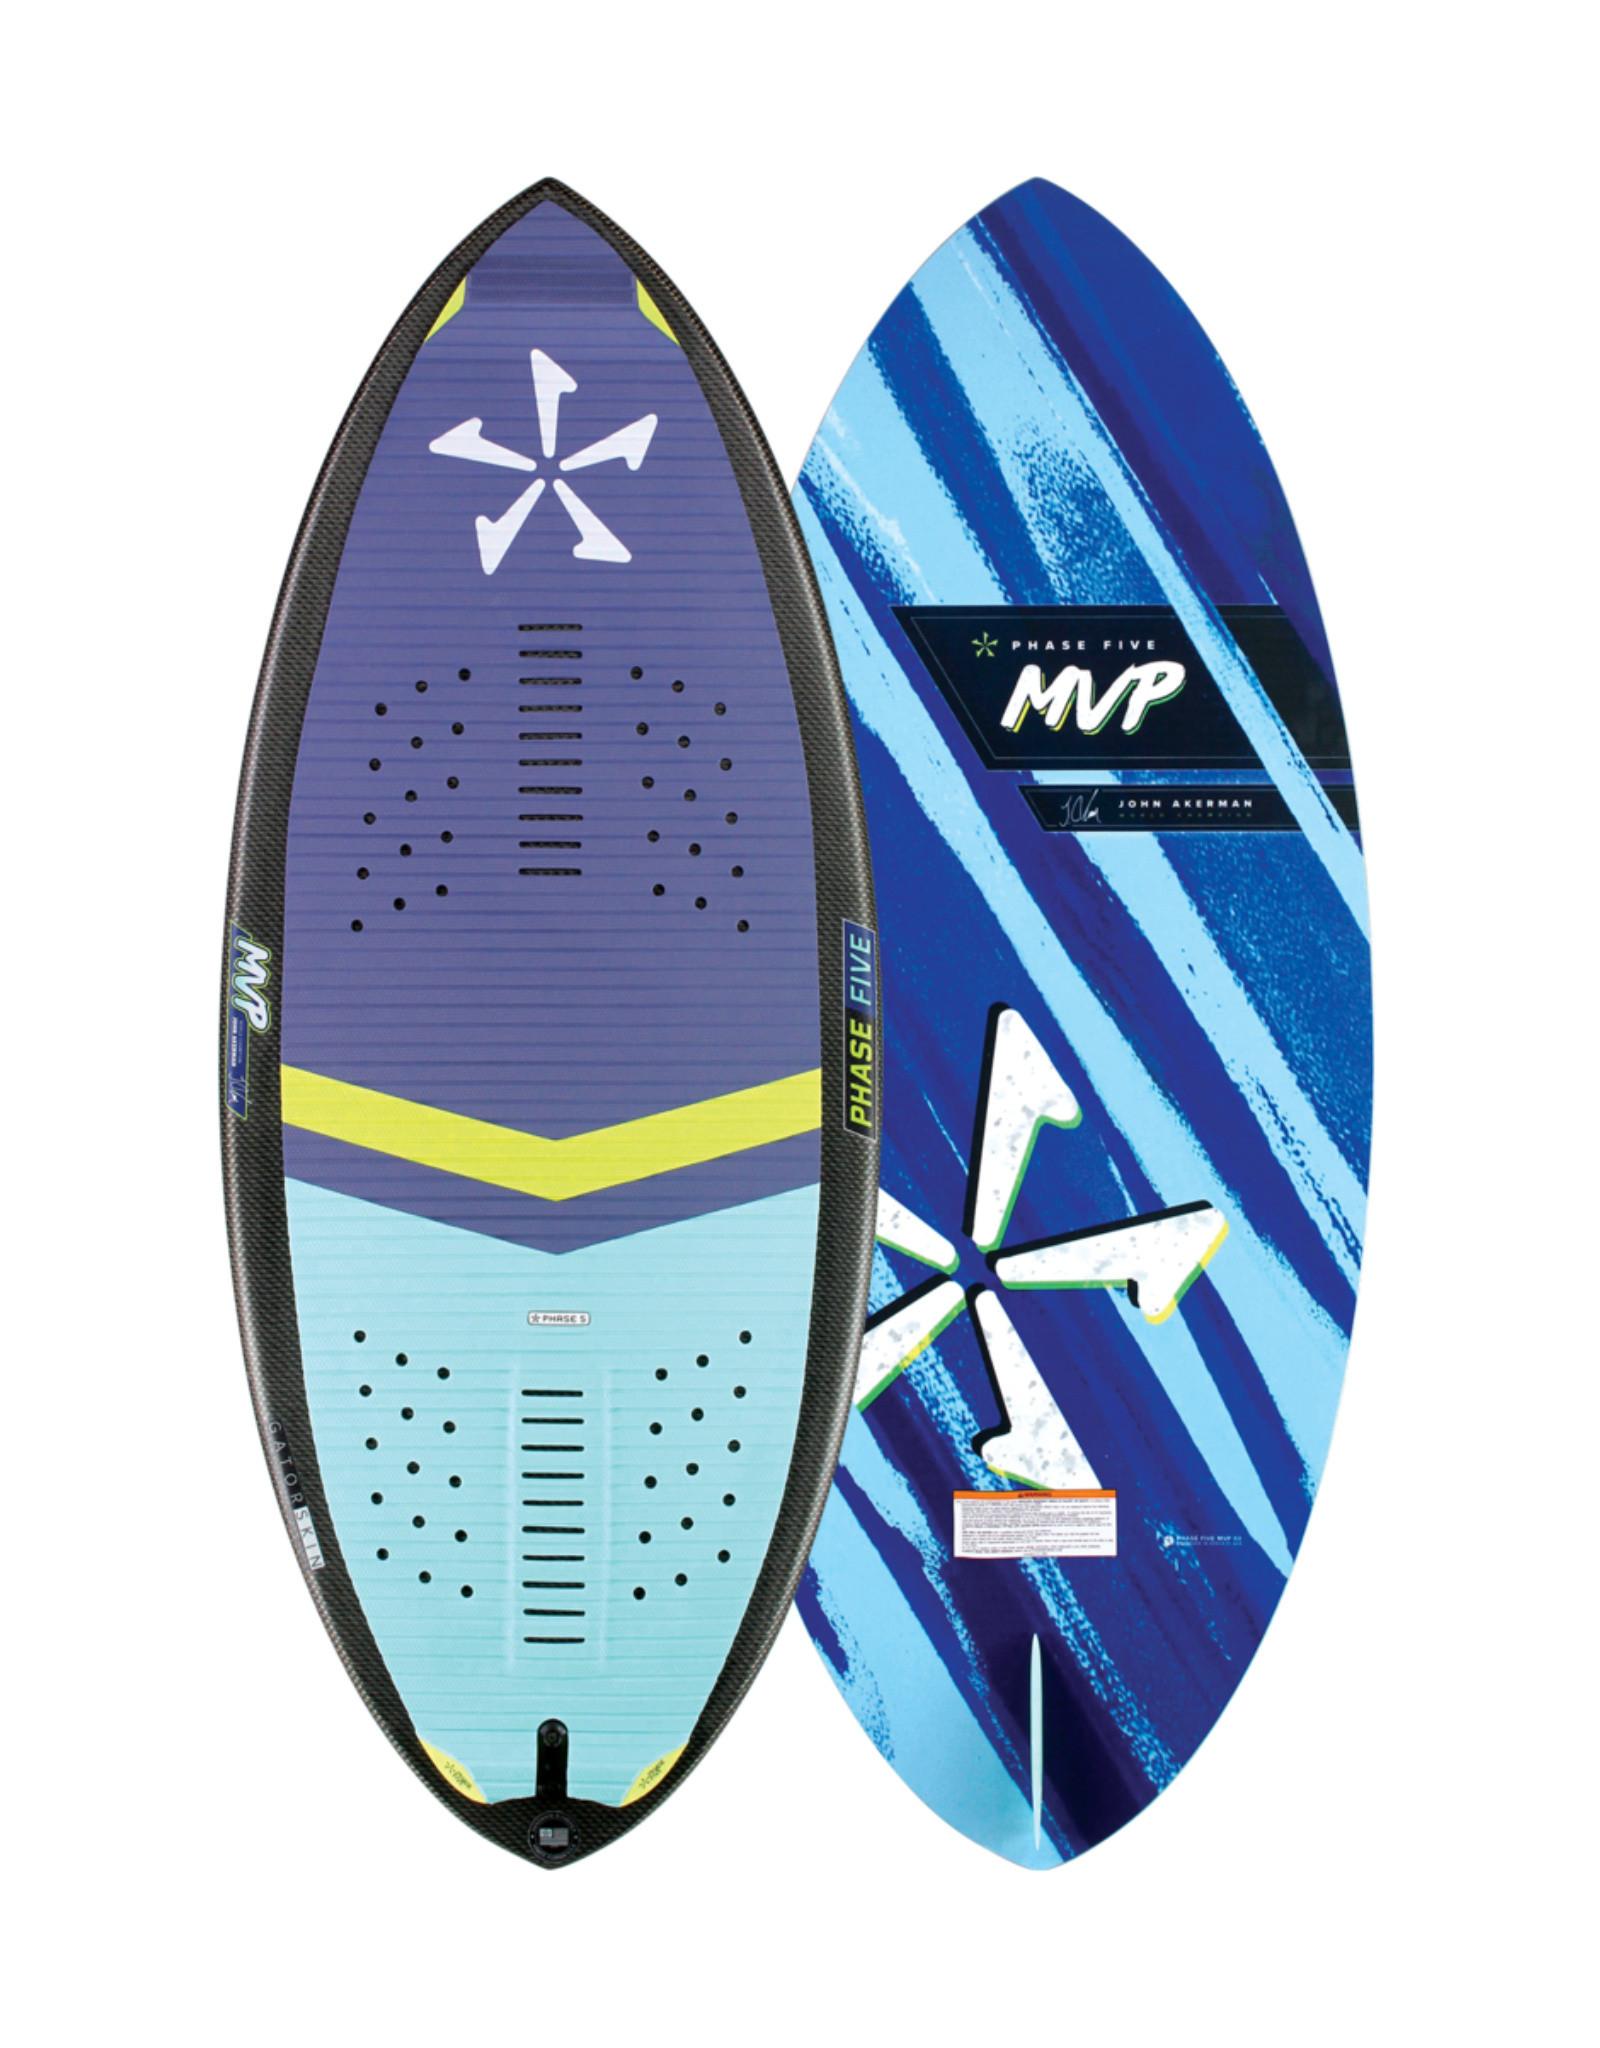 "Phase Five Phase Five MVP 53"" Skim Style Wakesurf"